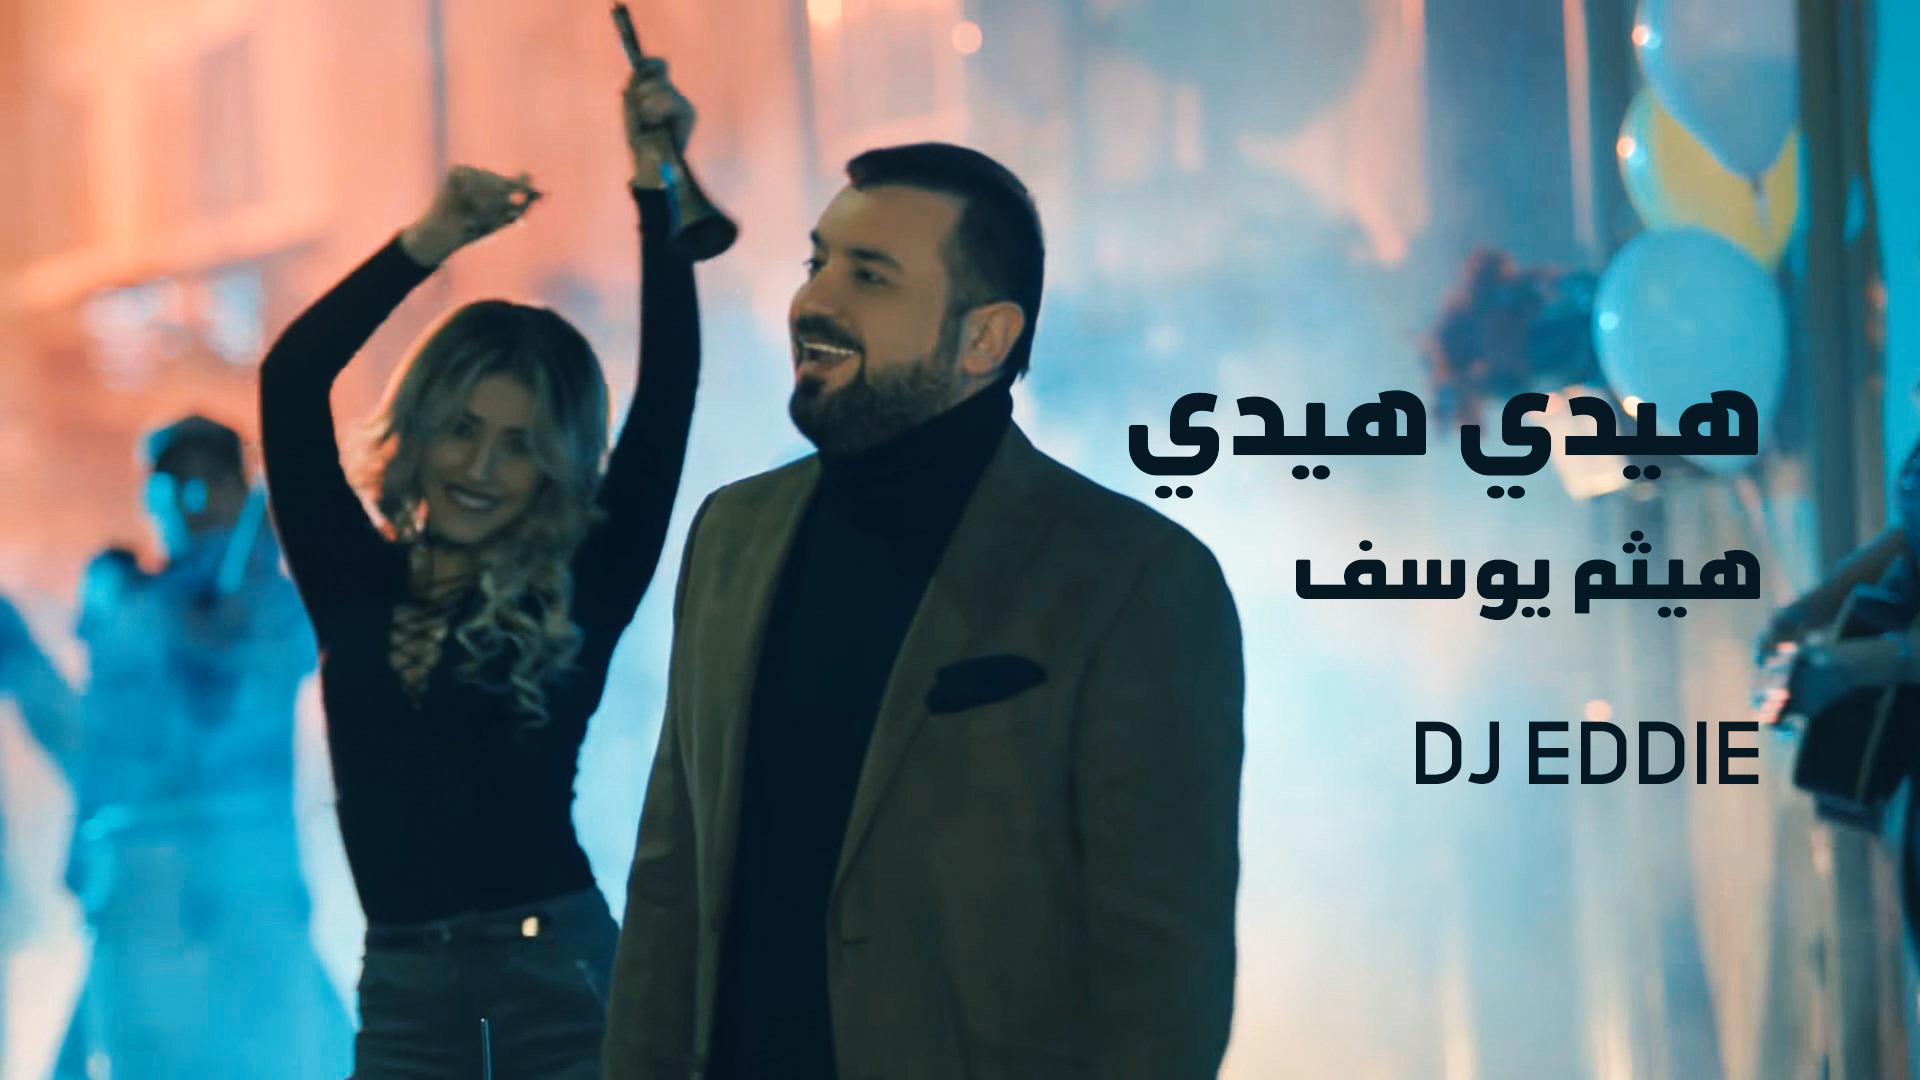 Haitham Yousif – Hedi Hedi هيثم يوسف – هيدي هيدي